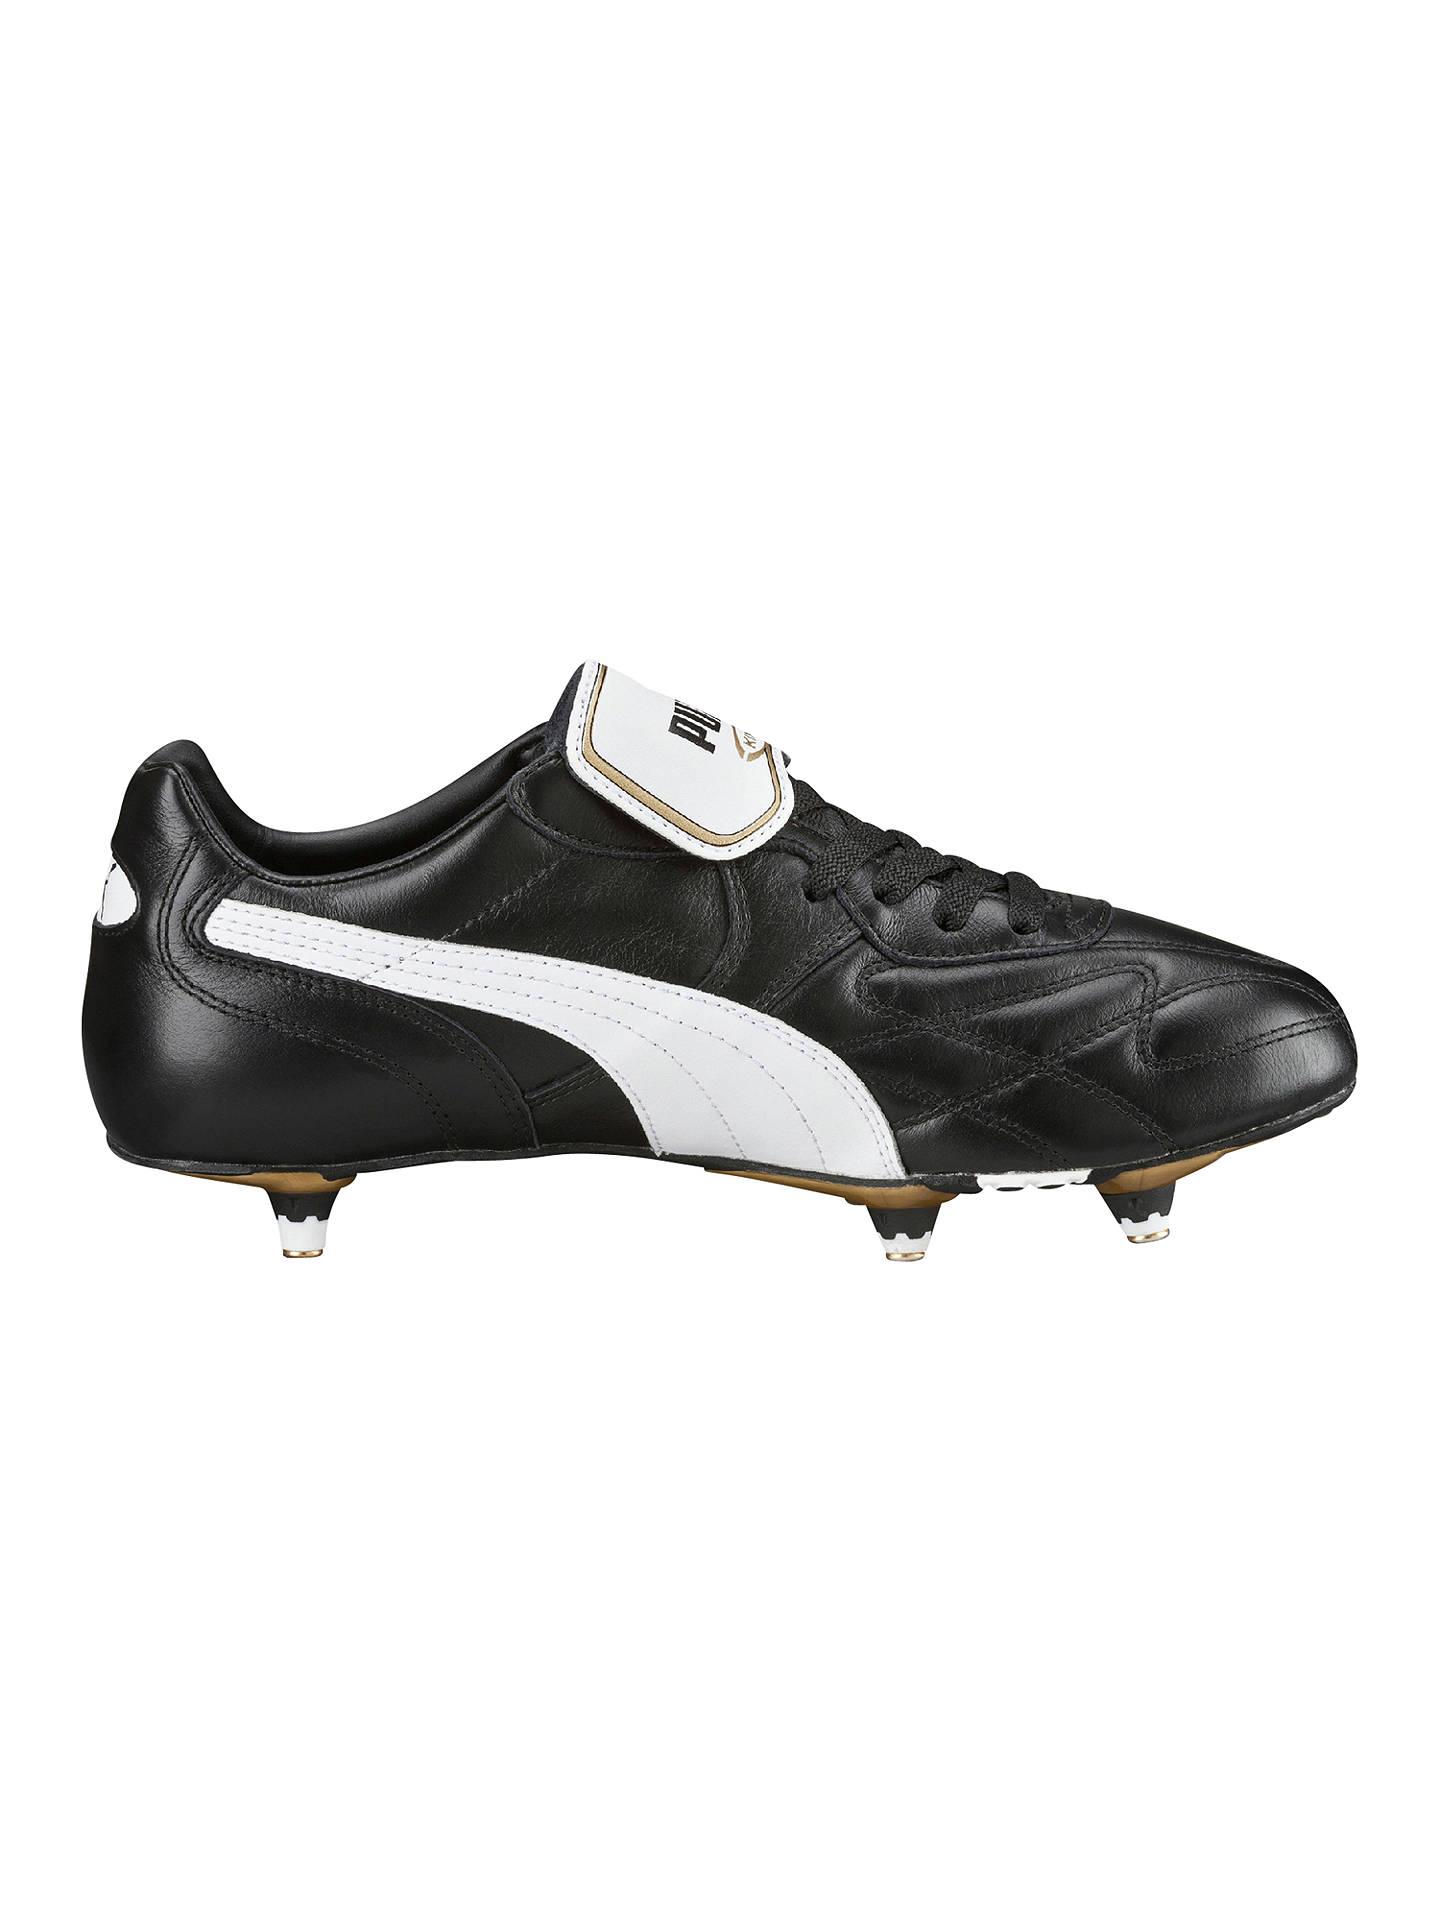 3b02ad3ca107 BuyPuma King Pro Football Boots